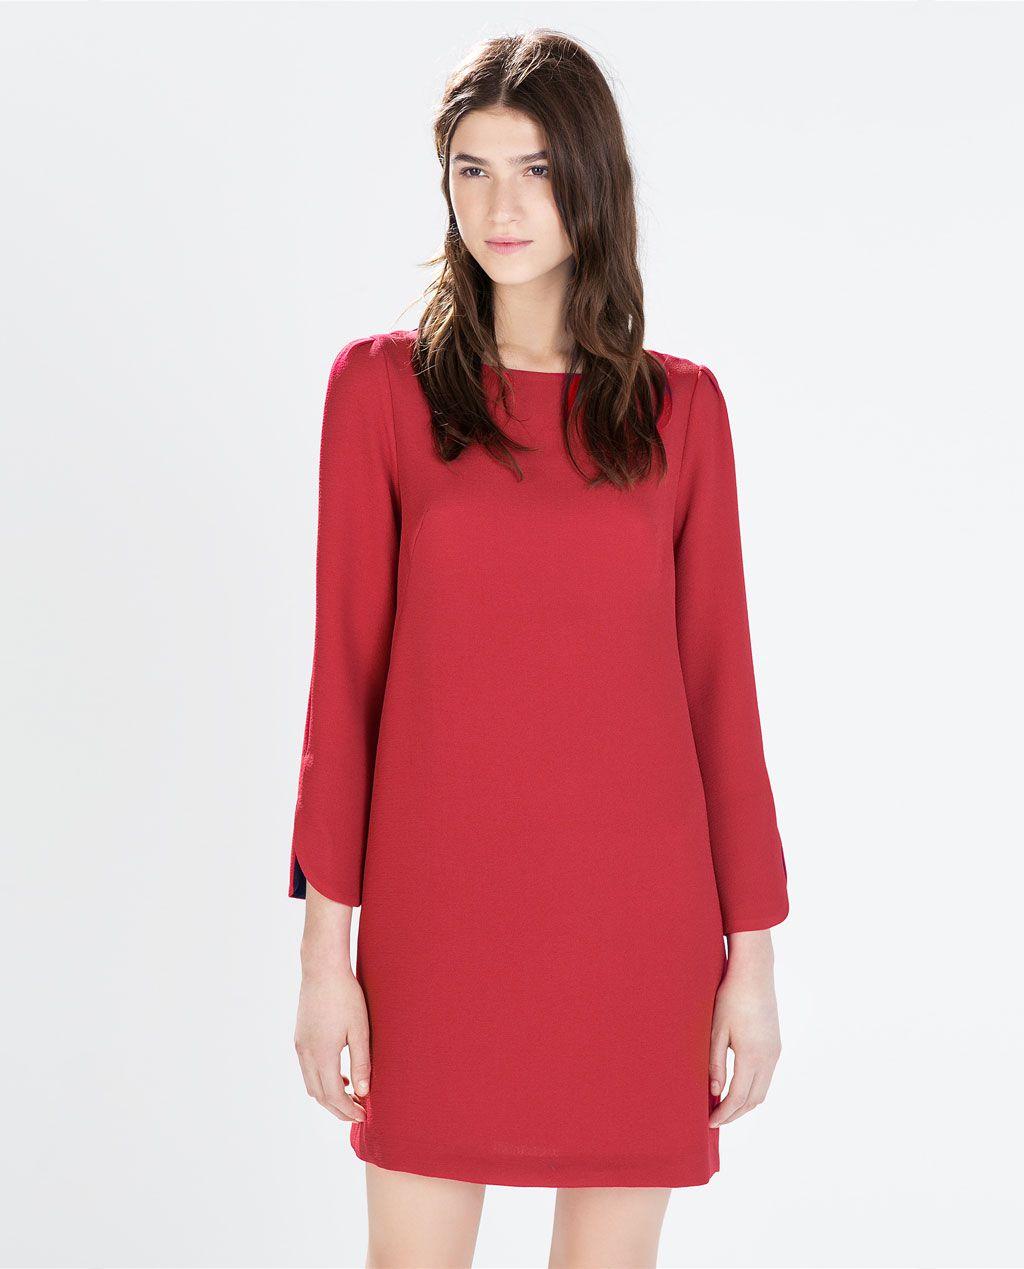 Image de robe droite de zara trucs pinterest straight dress